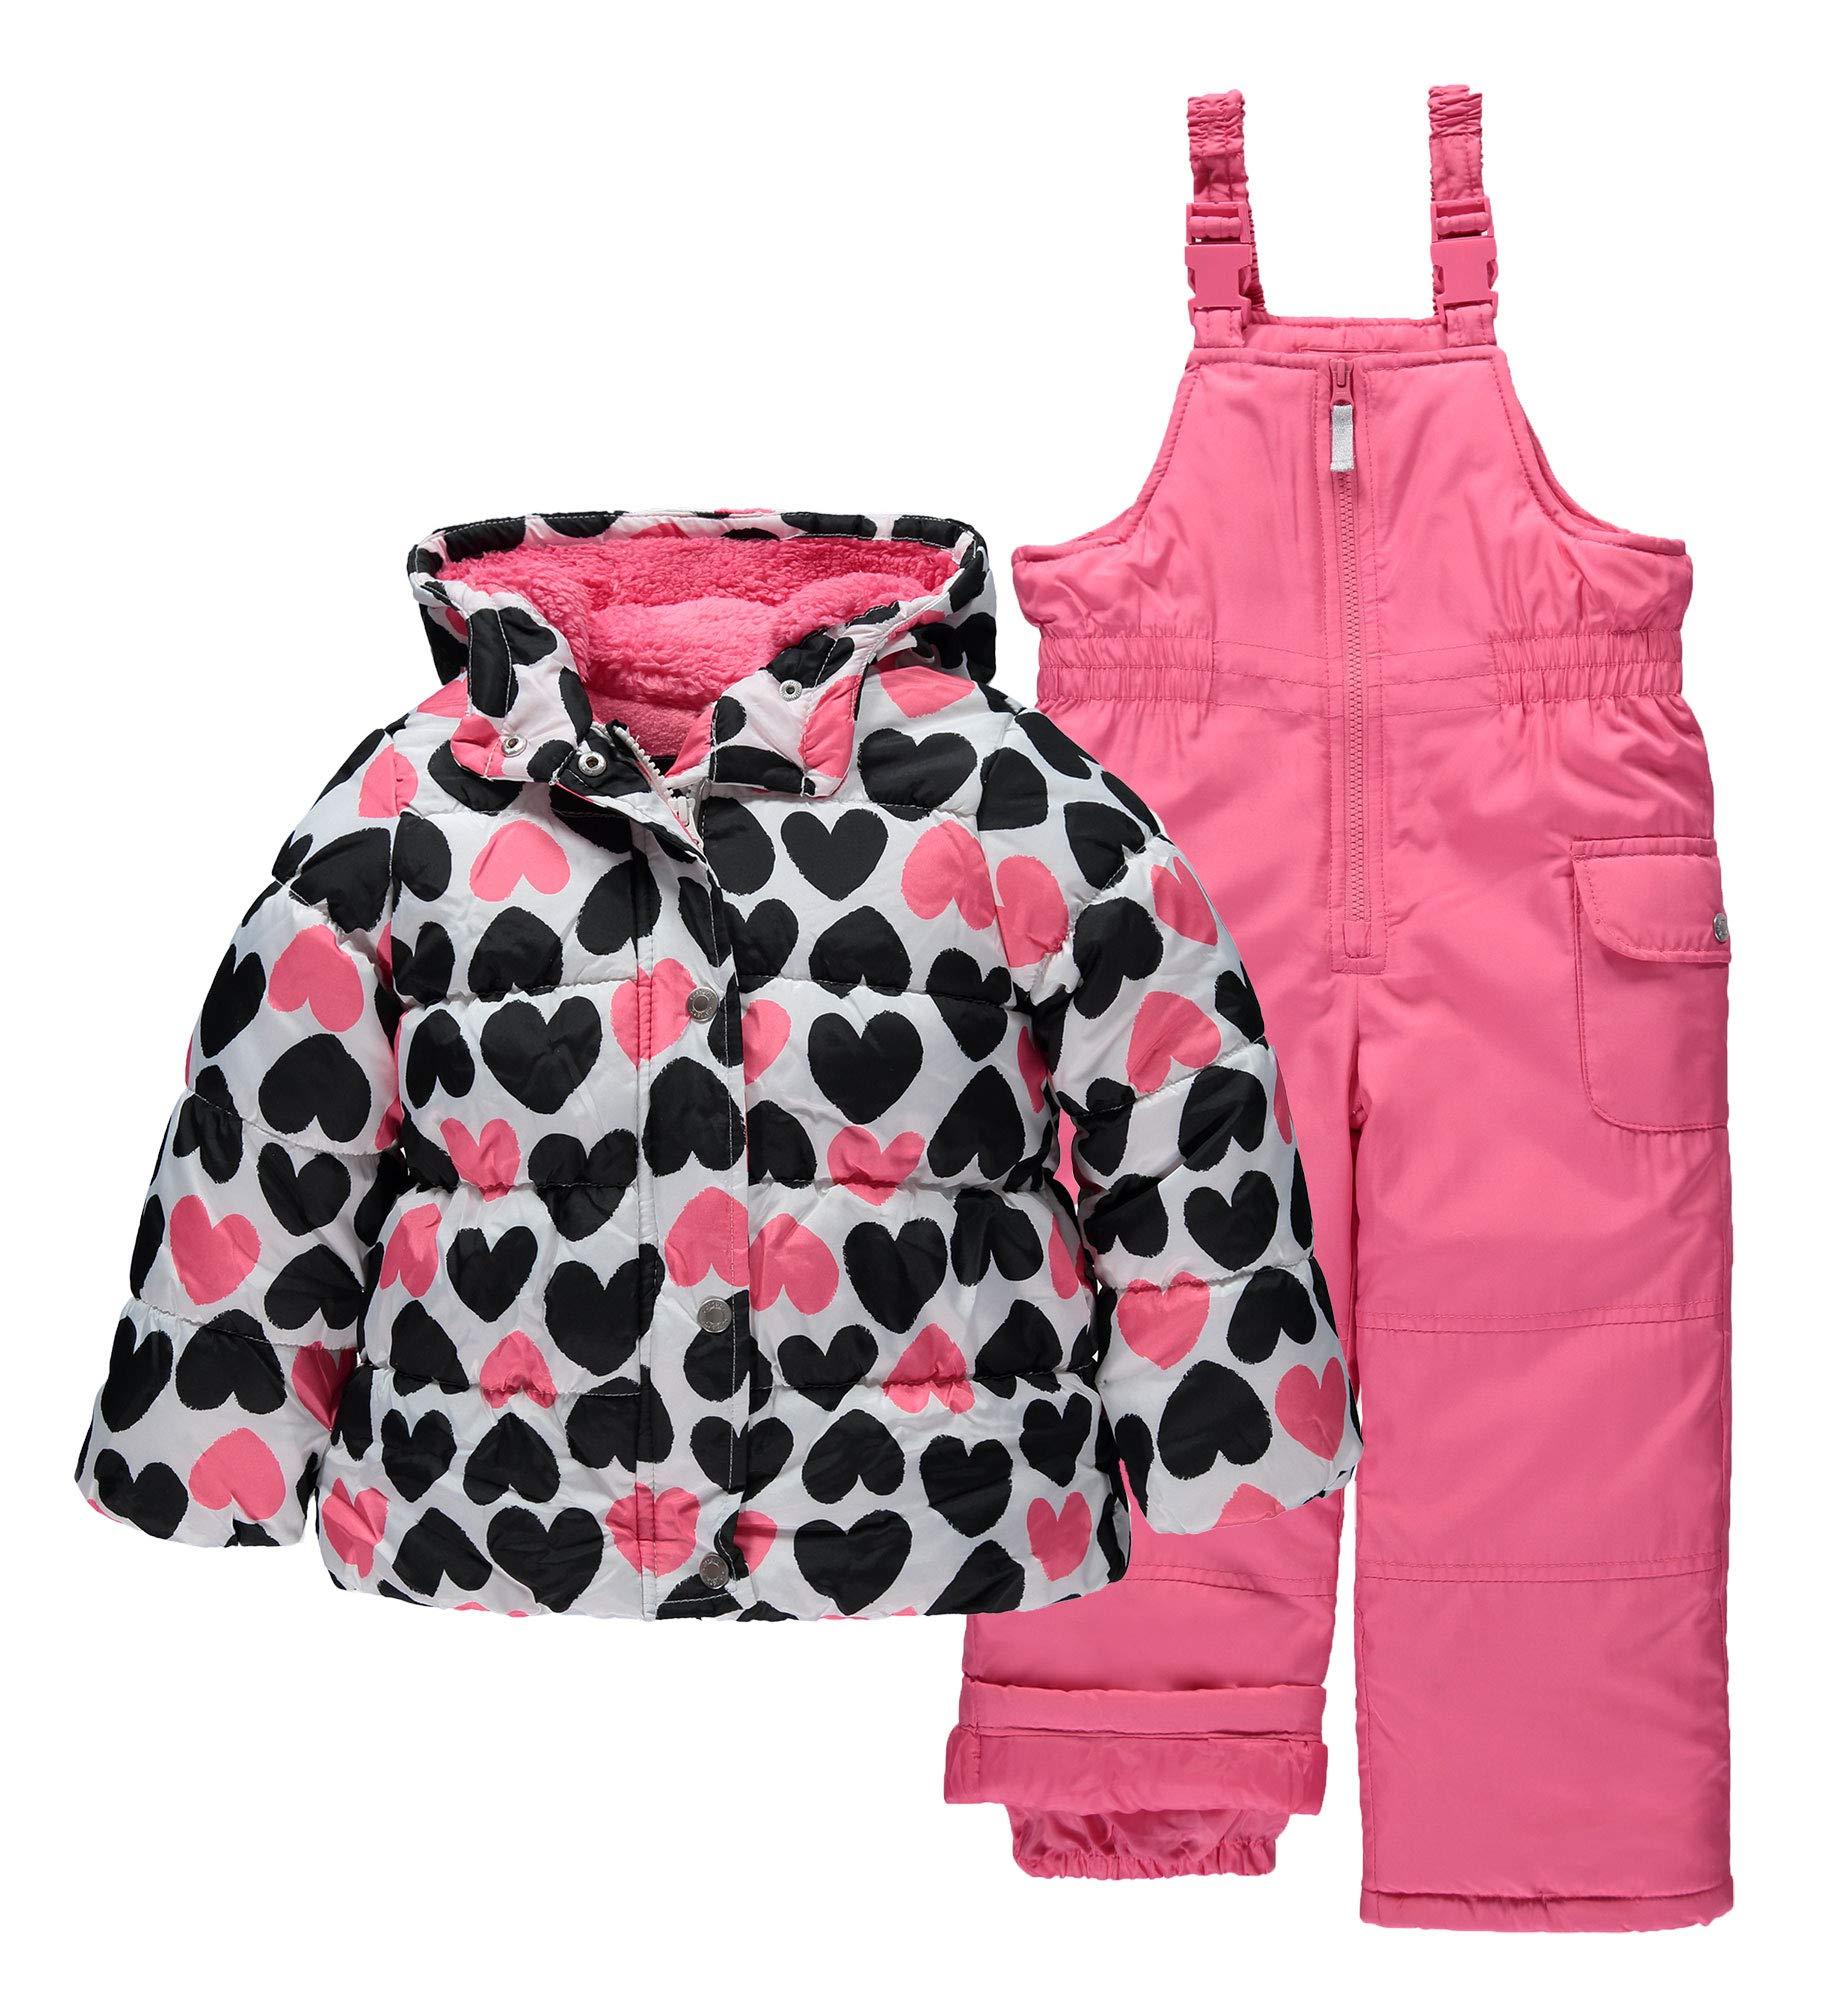 Carter's Girls' Little Heavyweight 2-Piece Skisuit Snowsuit, Black & Pink Hearts, 5/6 by Carter's